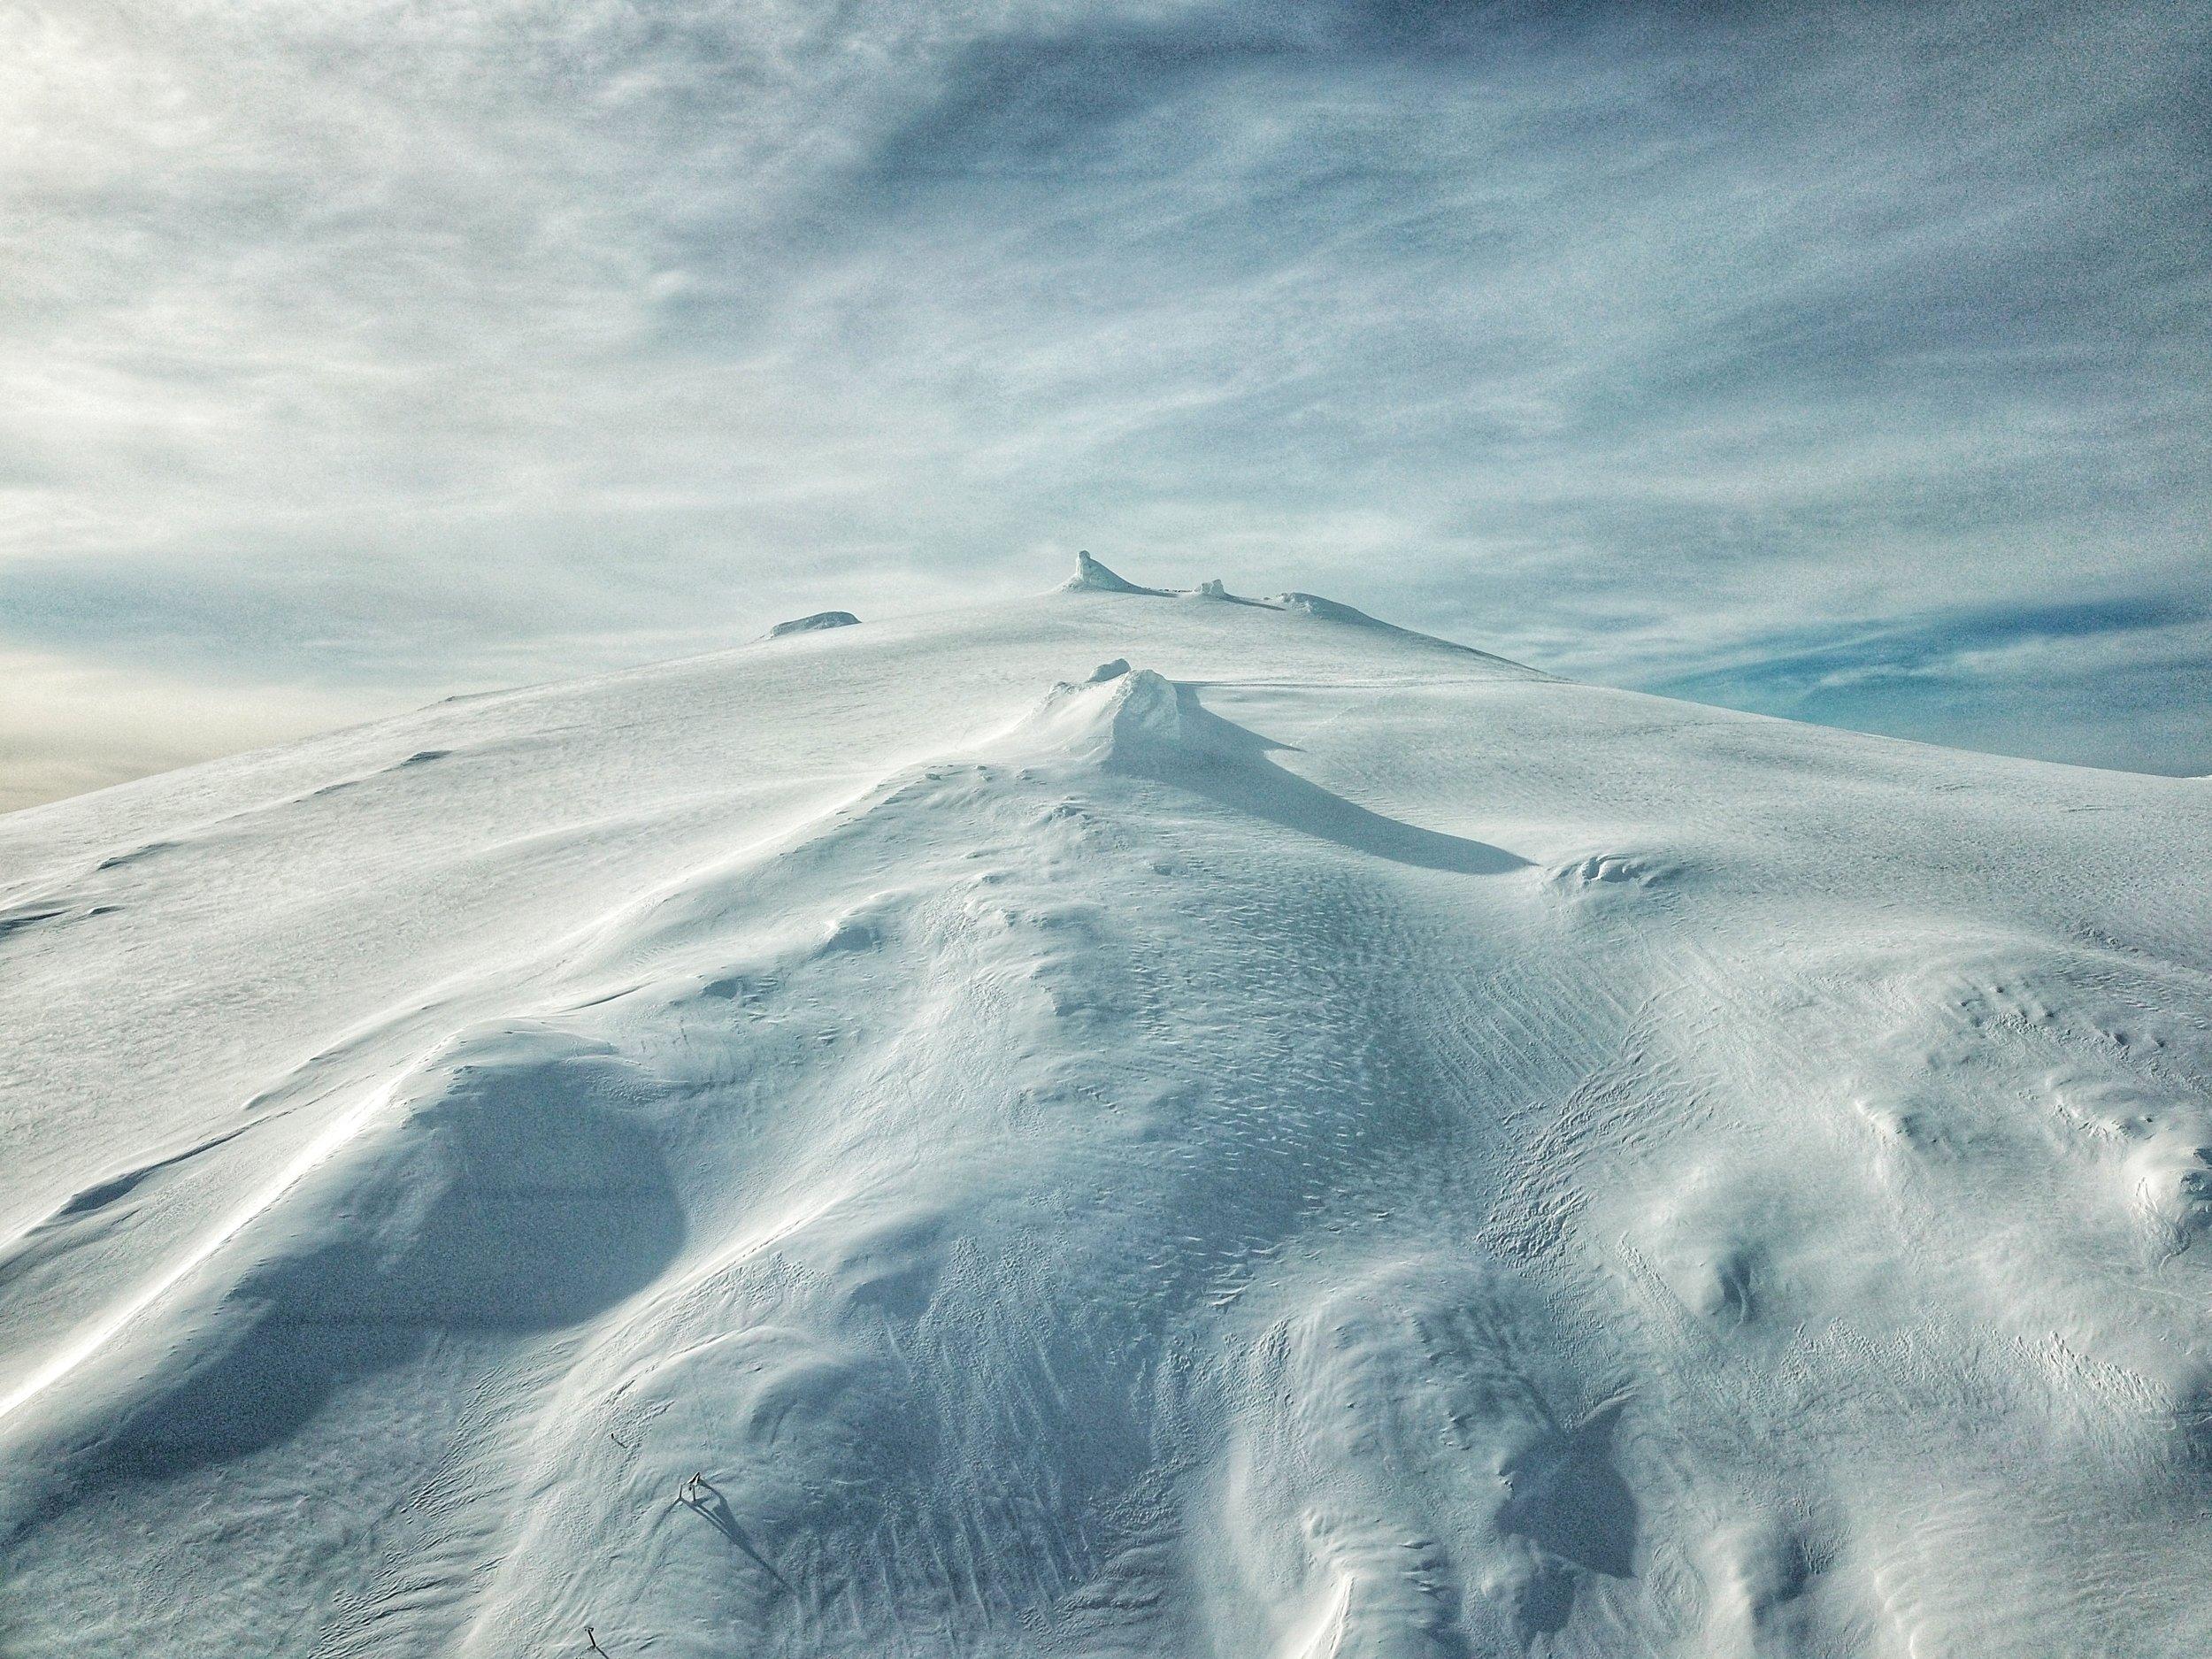 drone view of Snæfellsjökull glacier